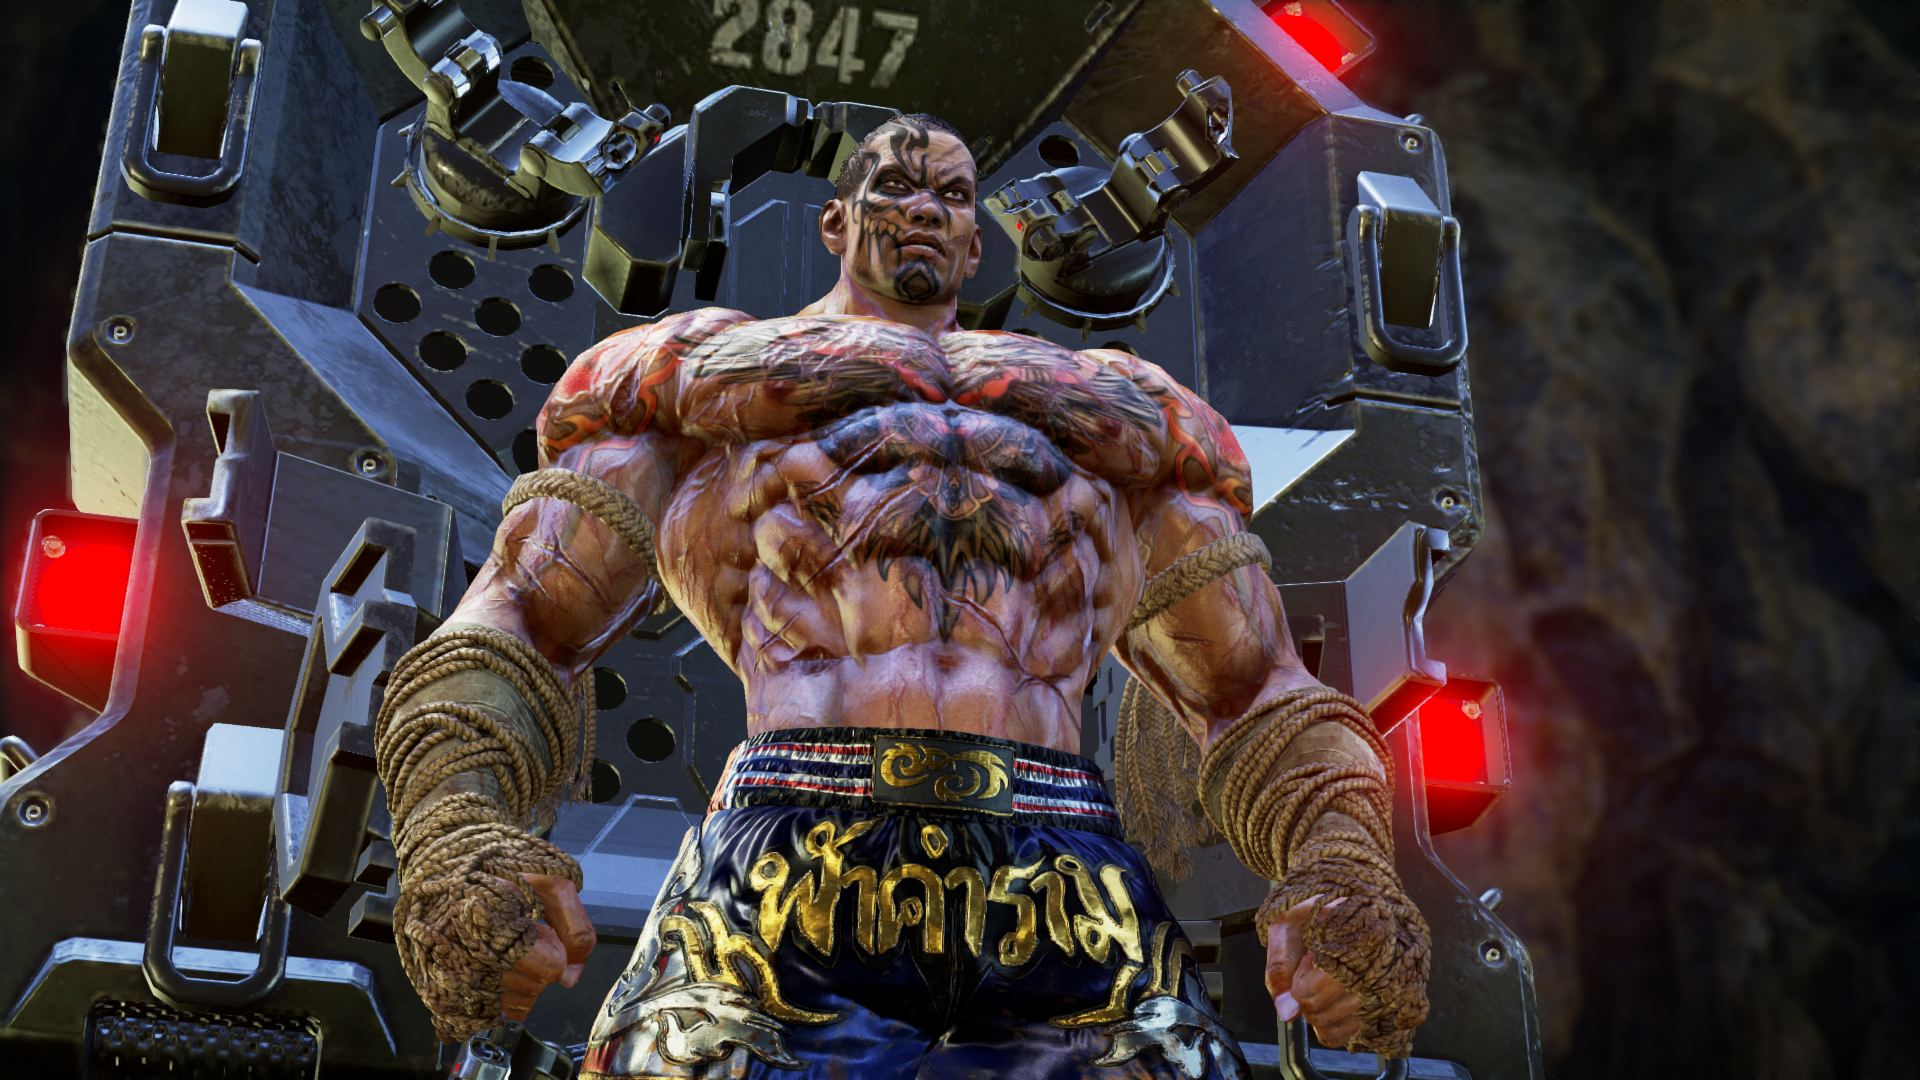 Fahkumram Tekken 7